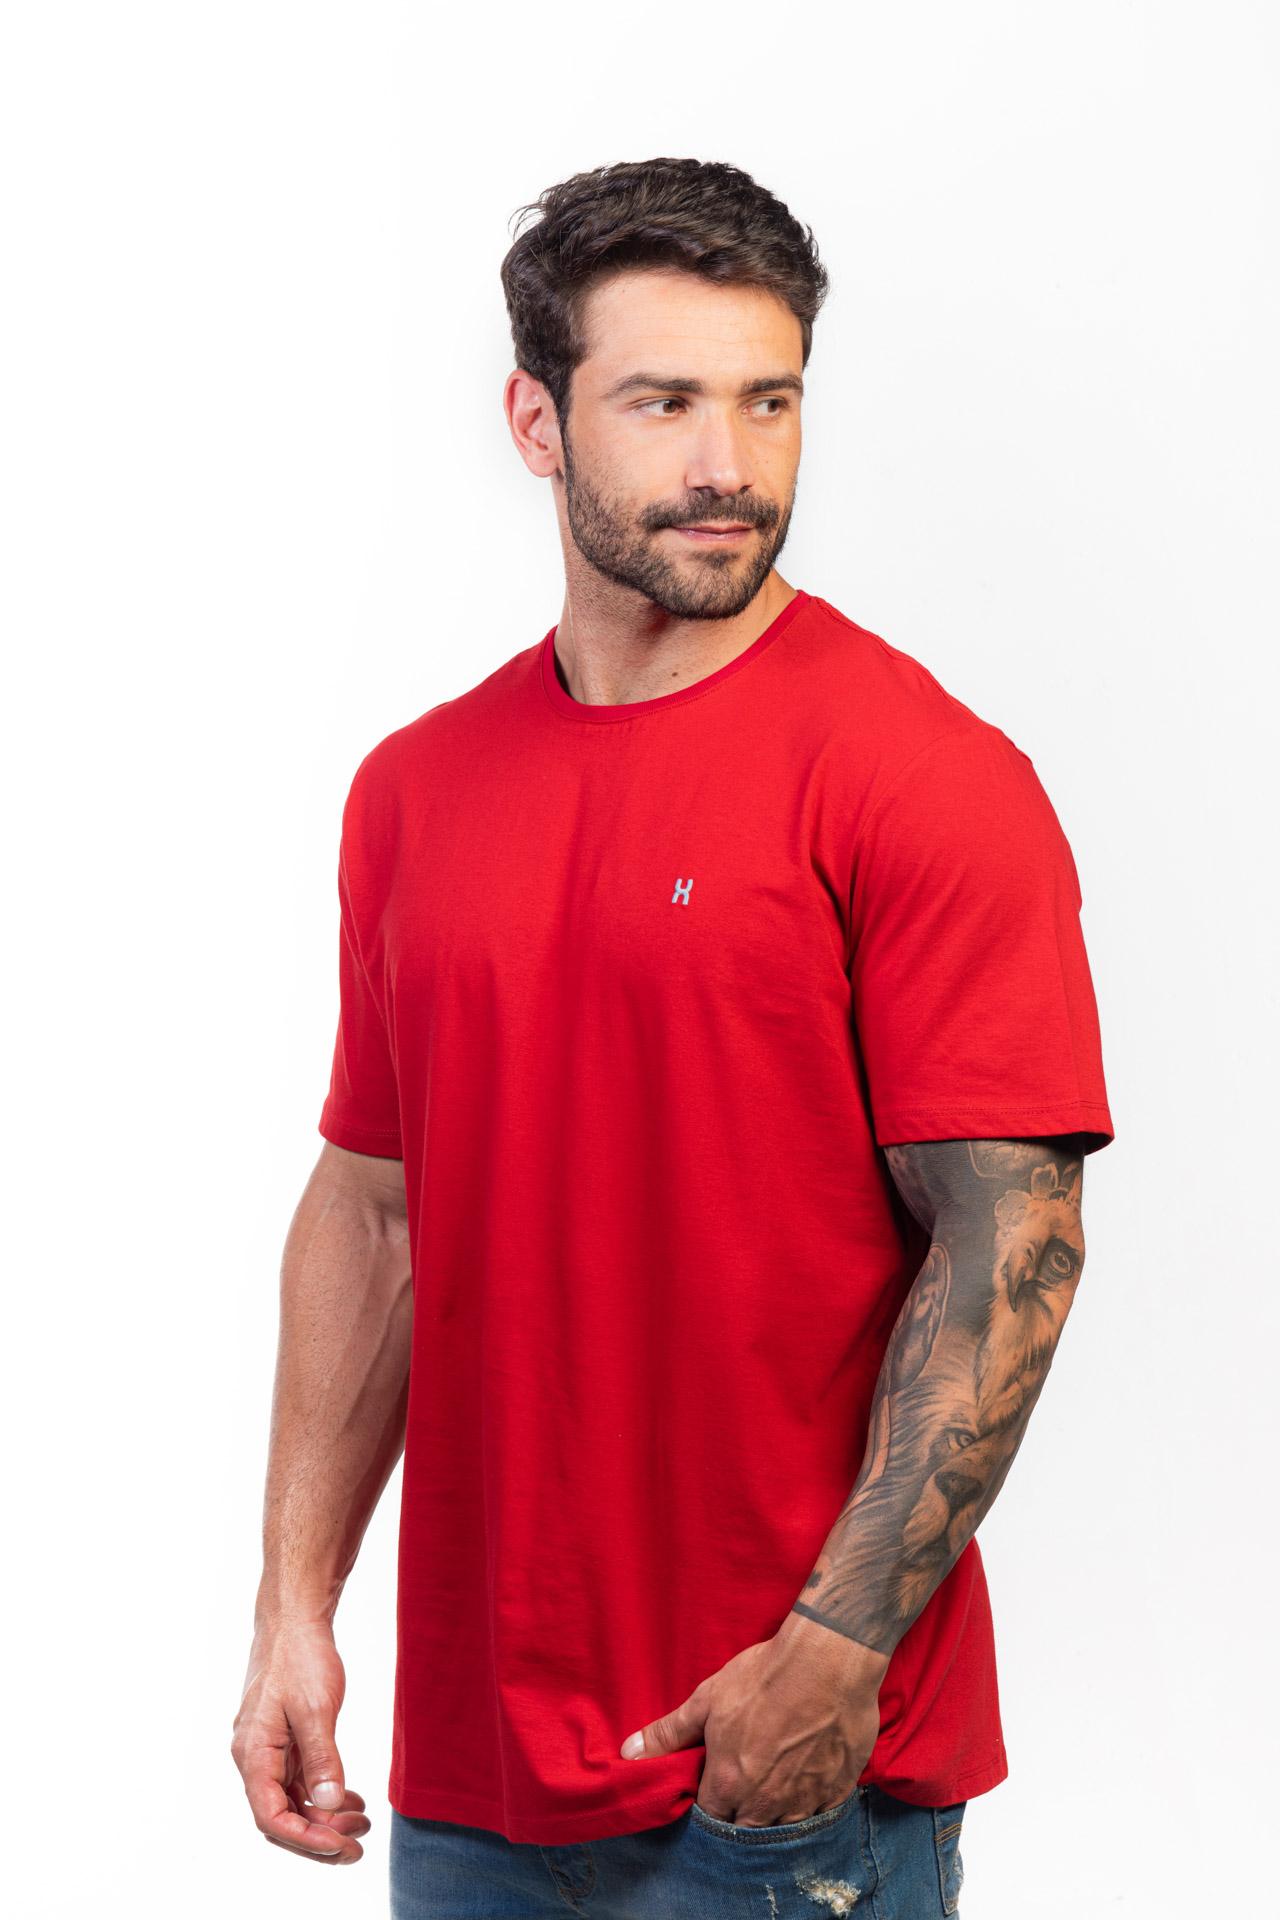 Camiseta Masculina TXC 1805